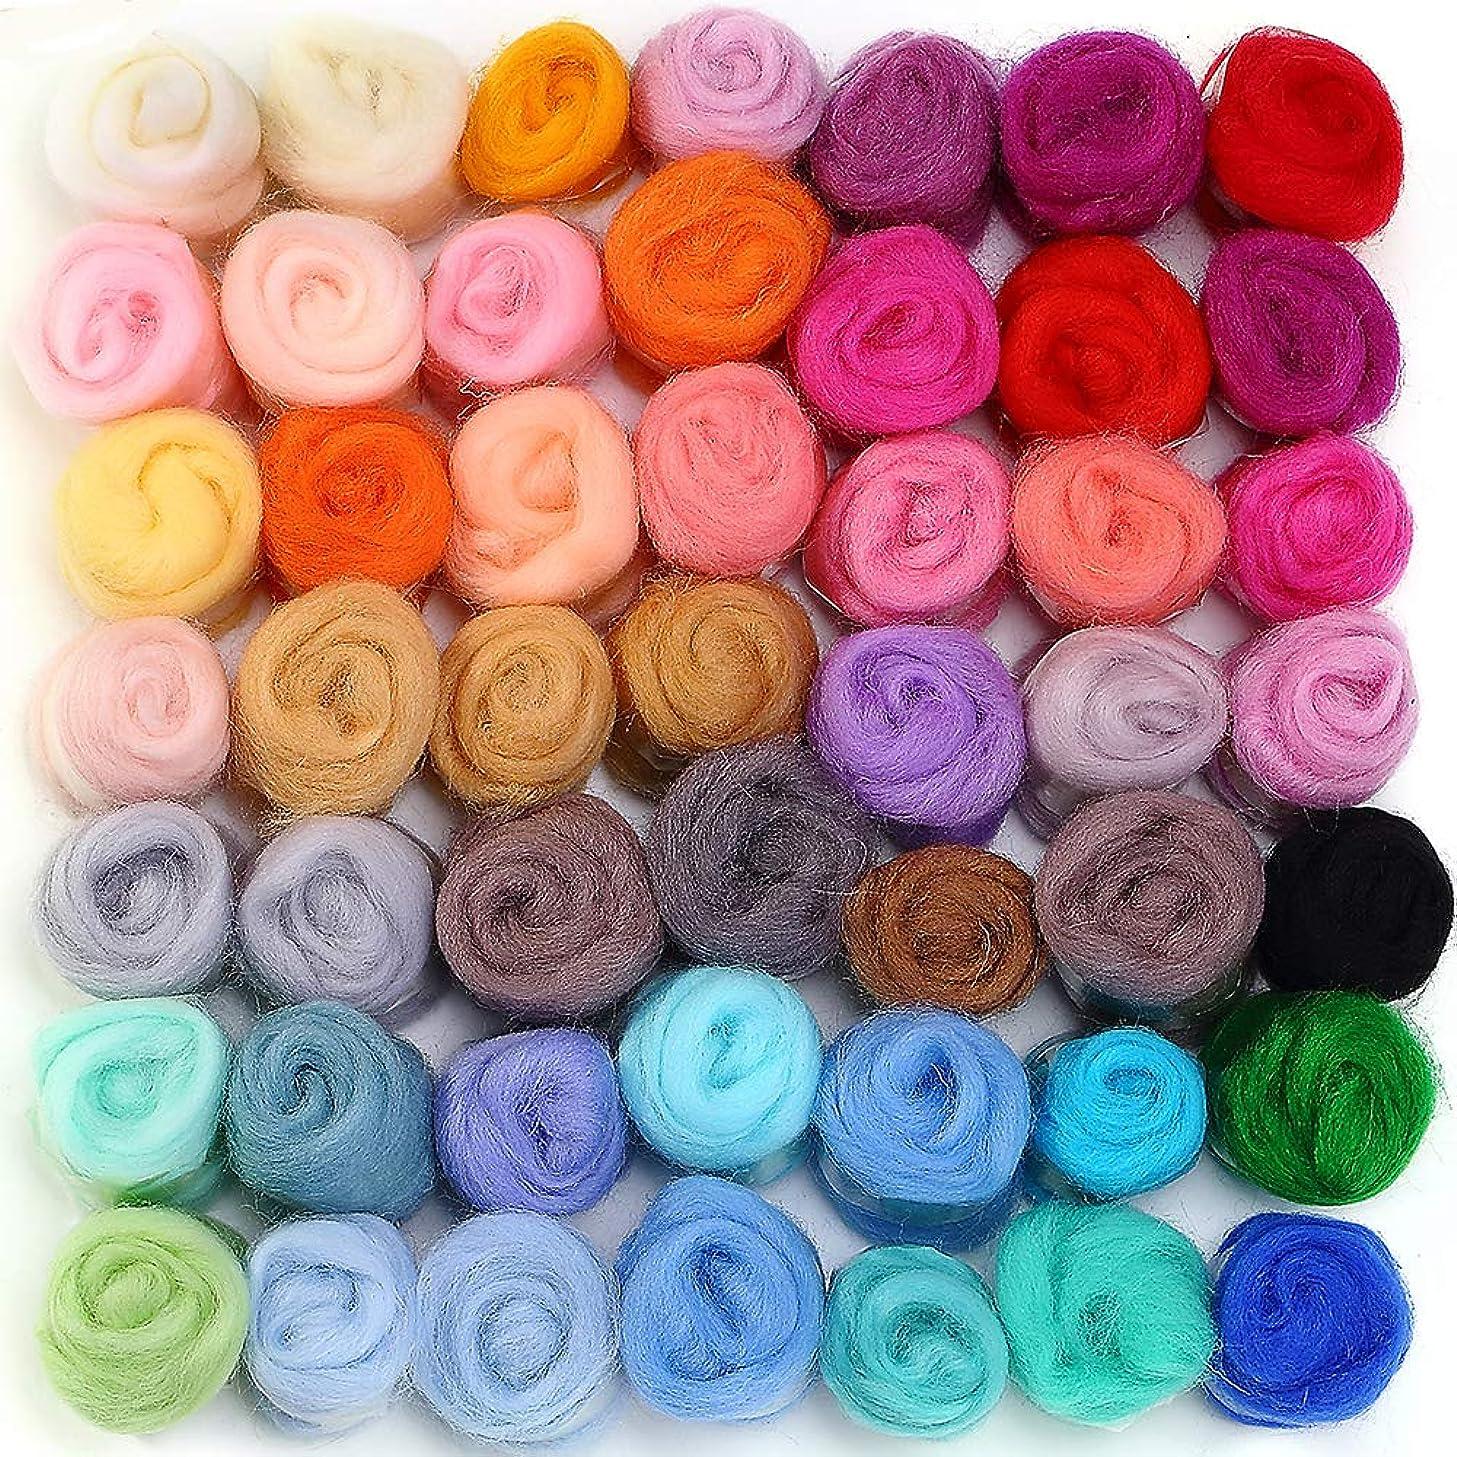 MOMODA 50 Colors Fibre Wool Yarn Roving for Needle Felting Hand Spinning DIY Craft Materials